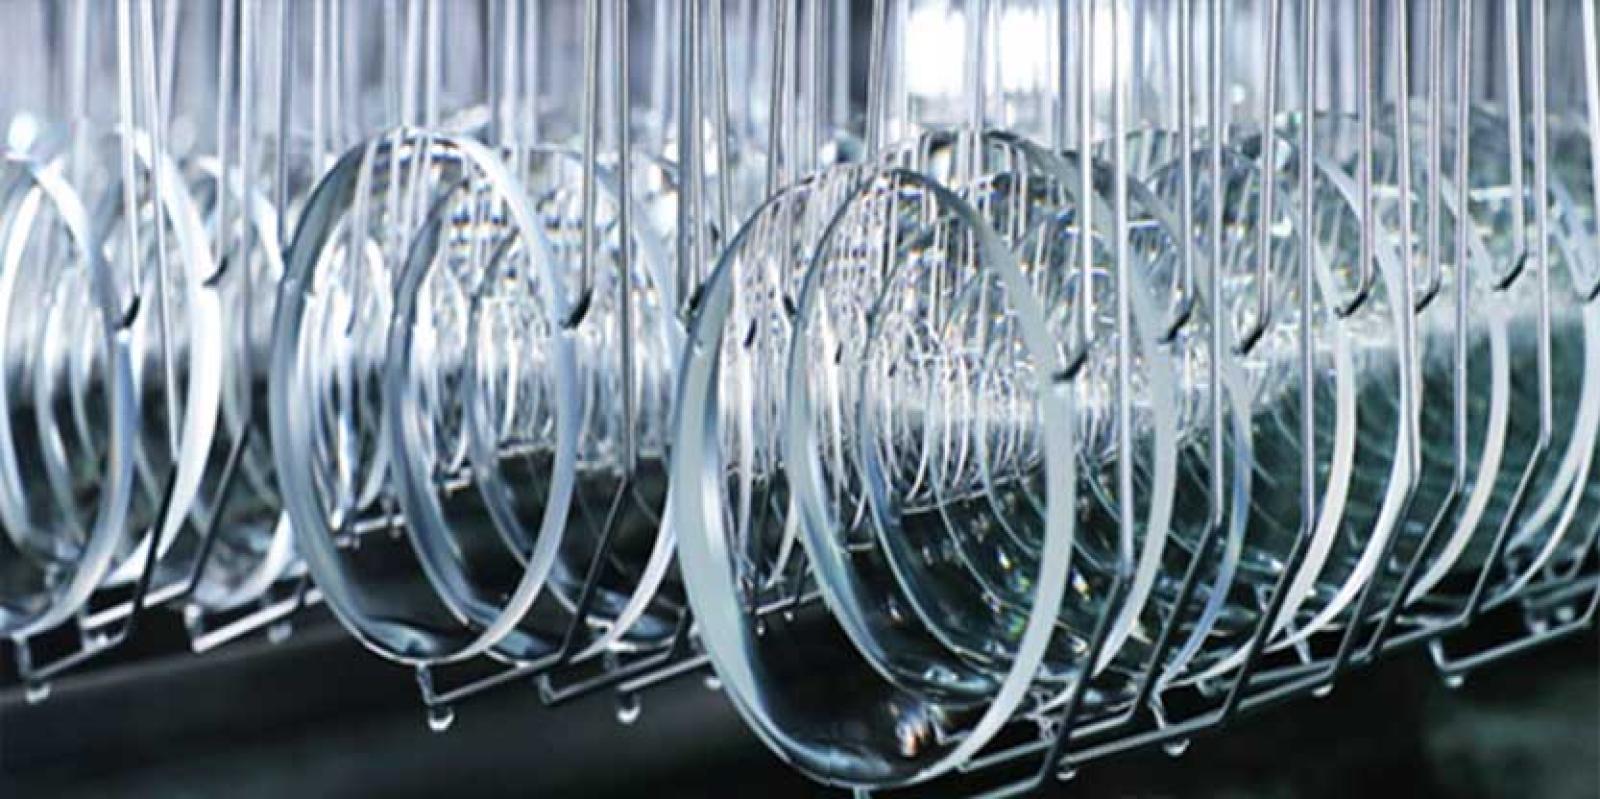 1.50 Digital Free Form Progressive (No-line multi-focal)-Translucent---Eyeglasses-additional2